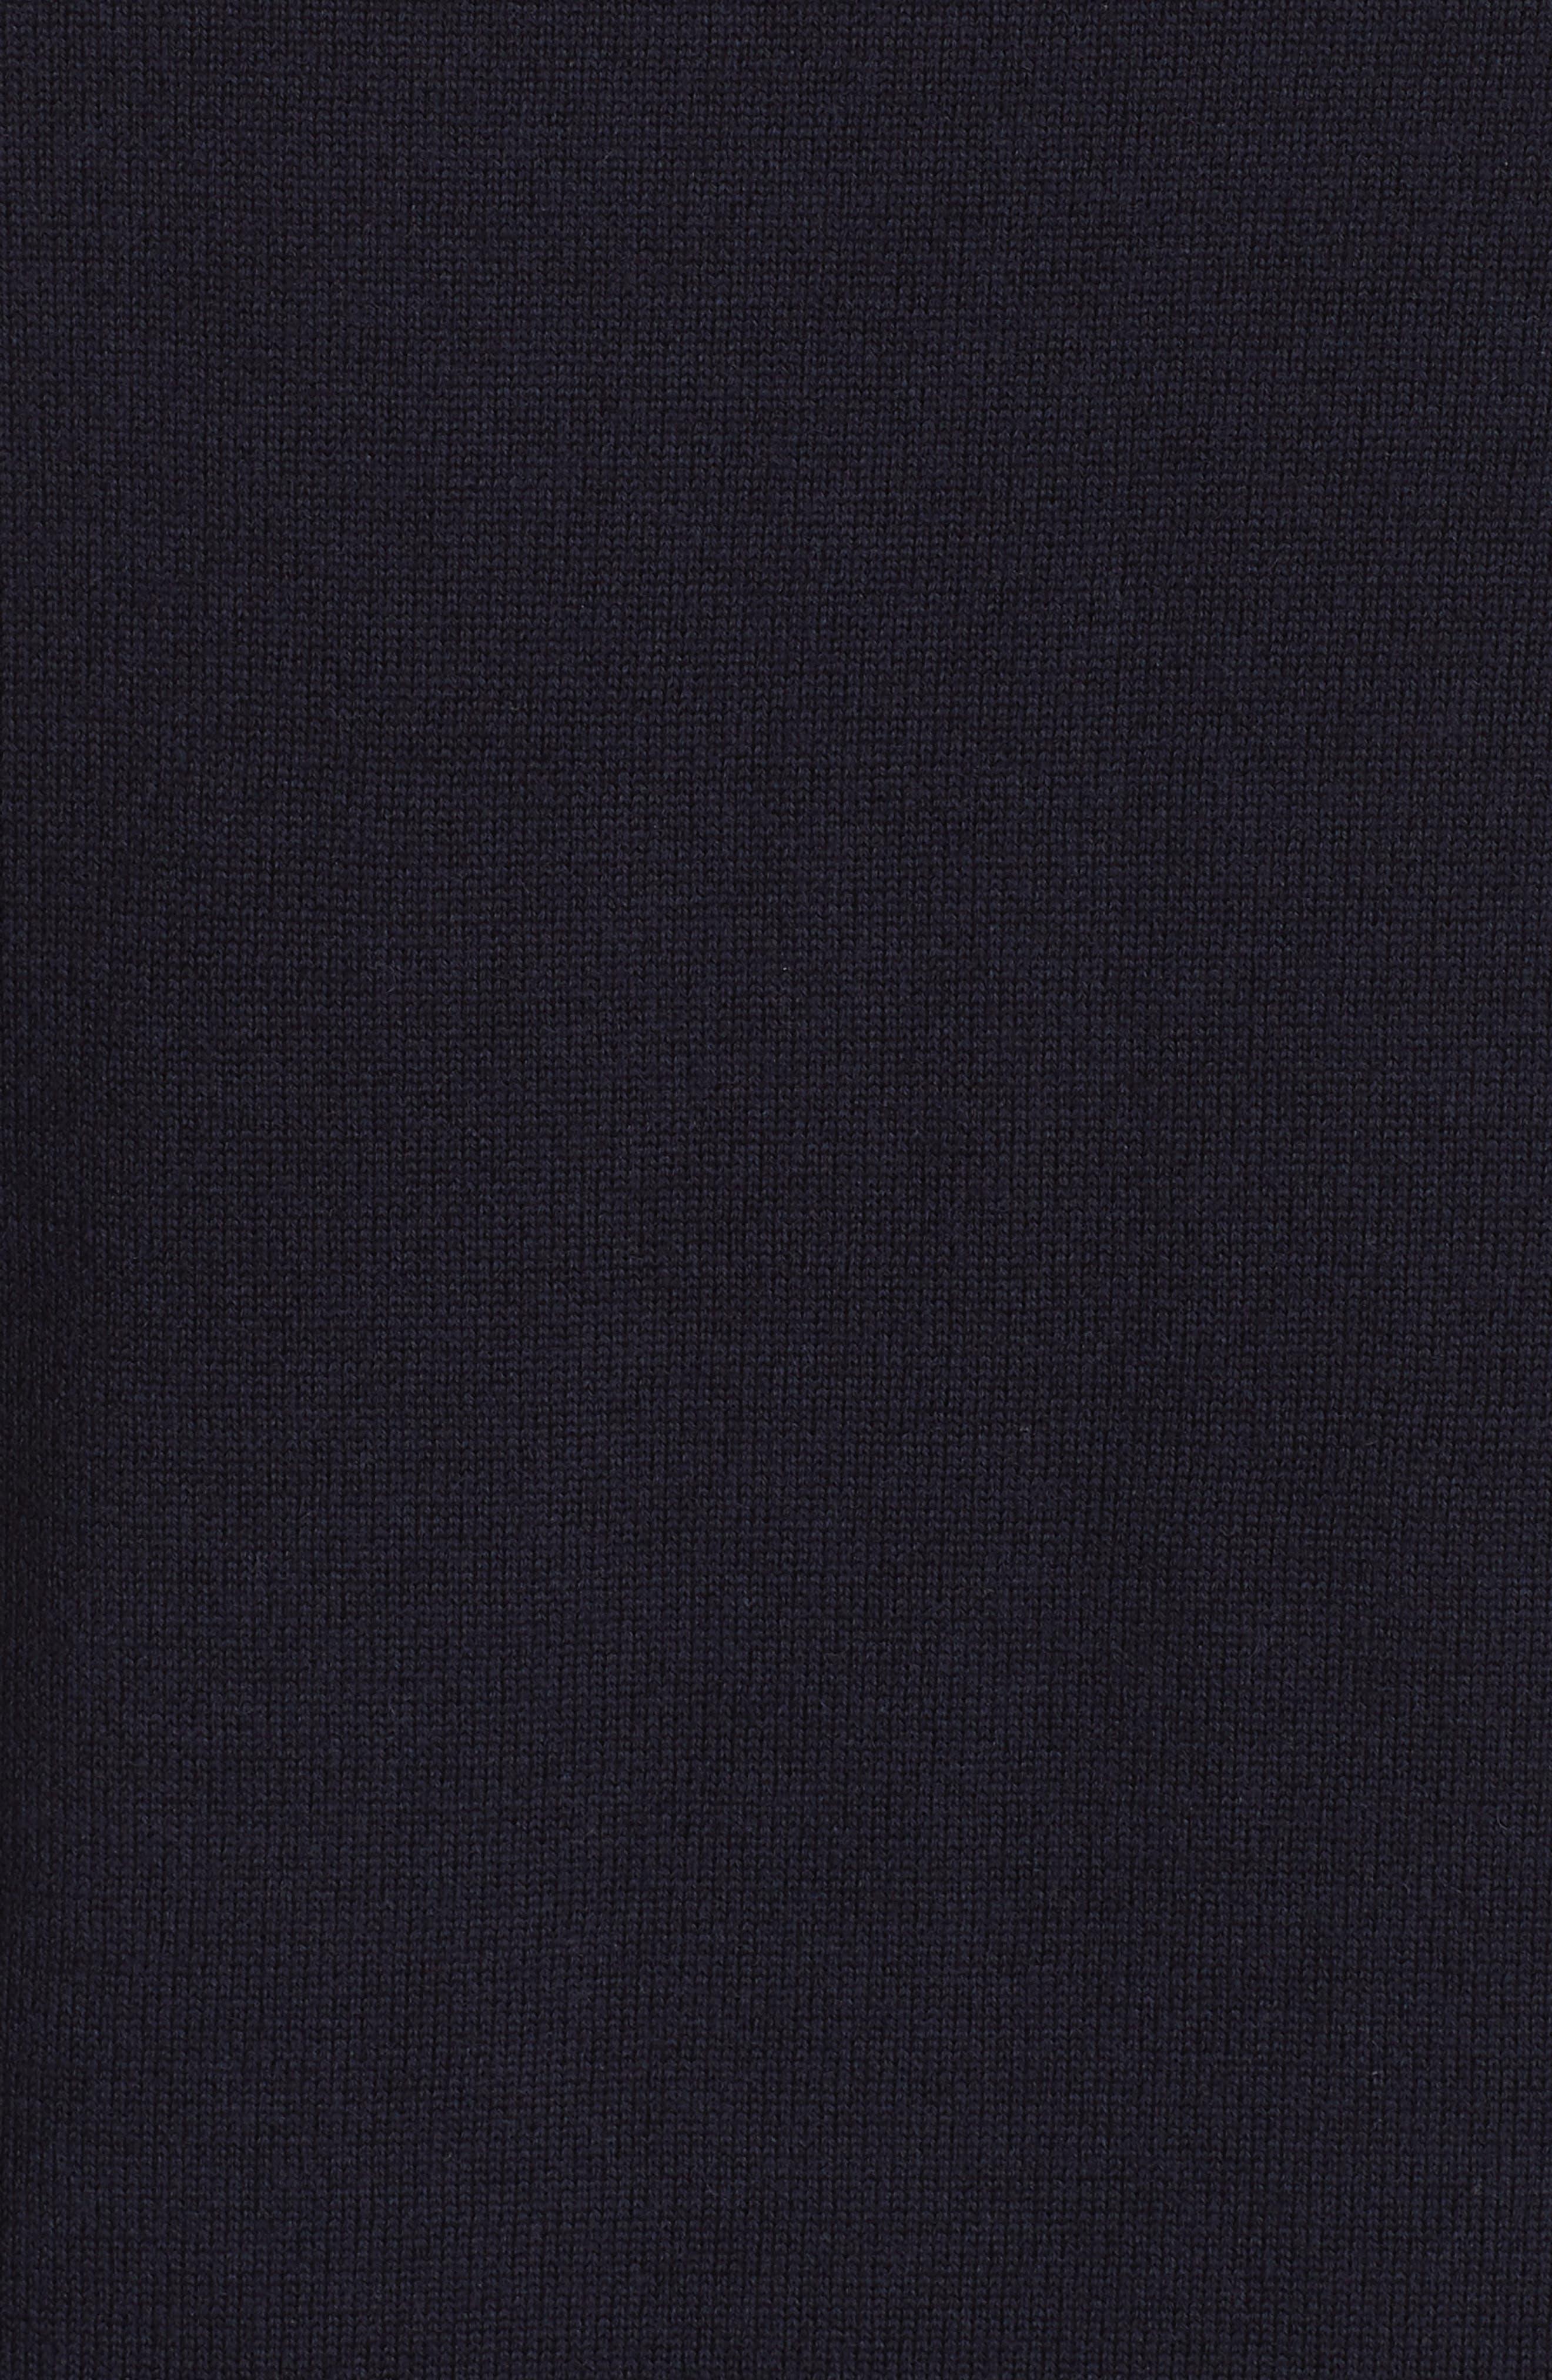 Mimic Raglan Sweater,                             Alternate thumbnail 5, color,                             NAVY